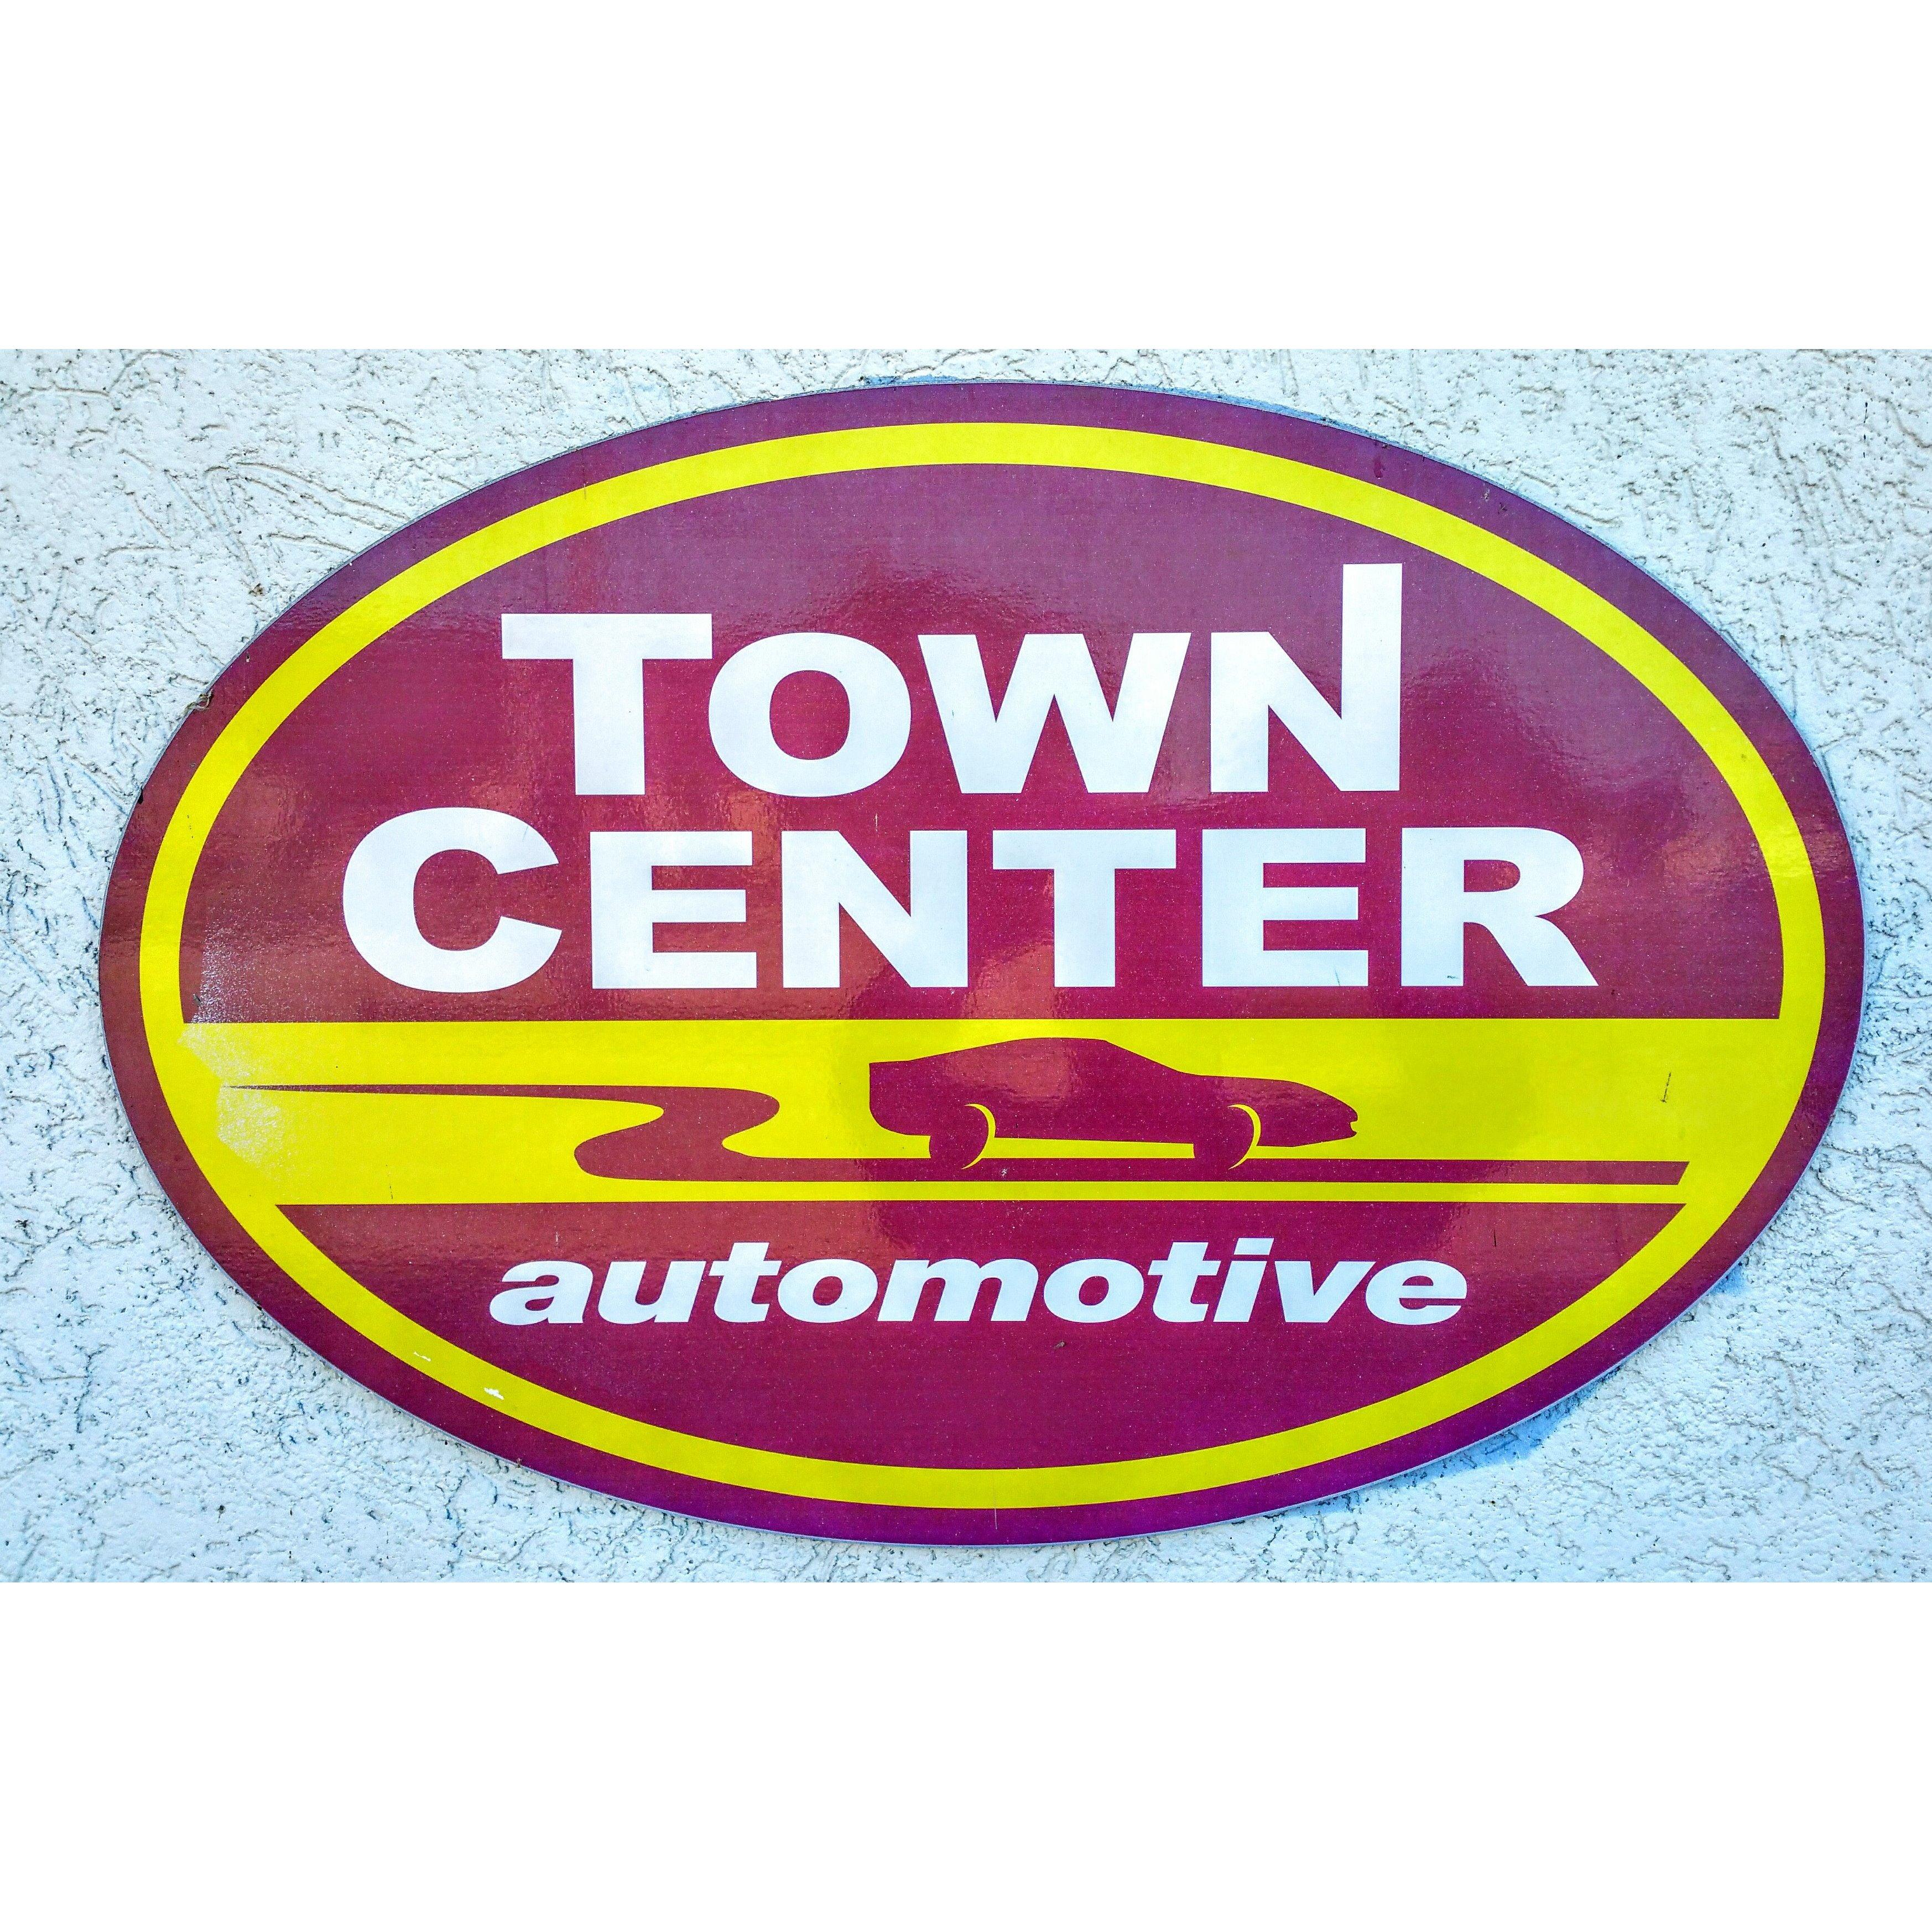 Town Center Automotive - Wickliffe, OH - General Auto Repair & Service